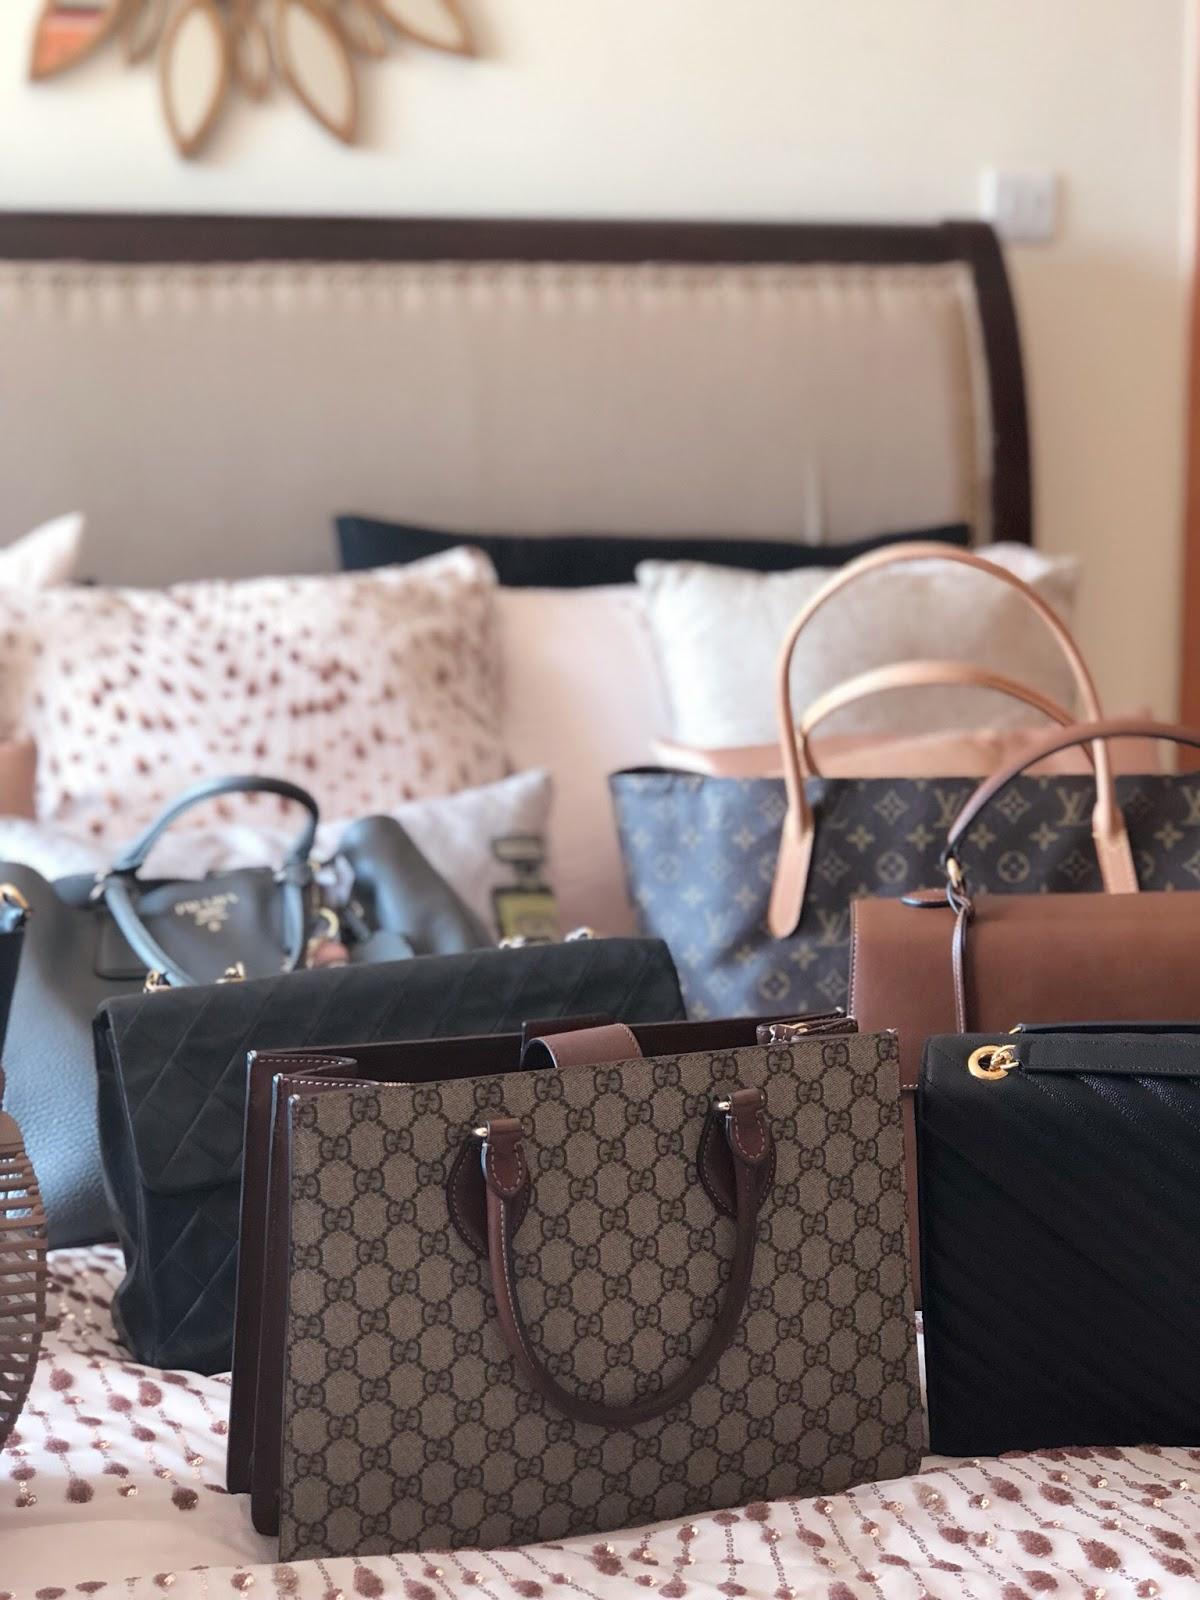 ea52b1a902f8f A look at My Luxury Handbag Collection